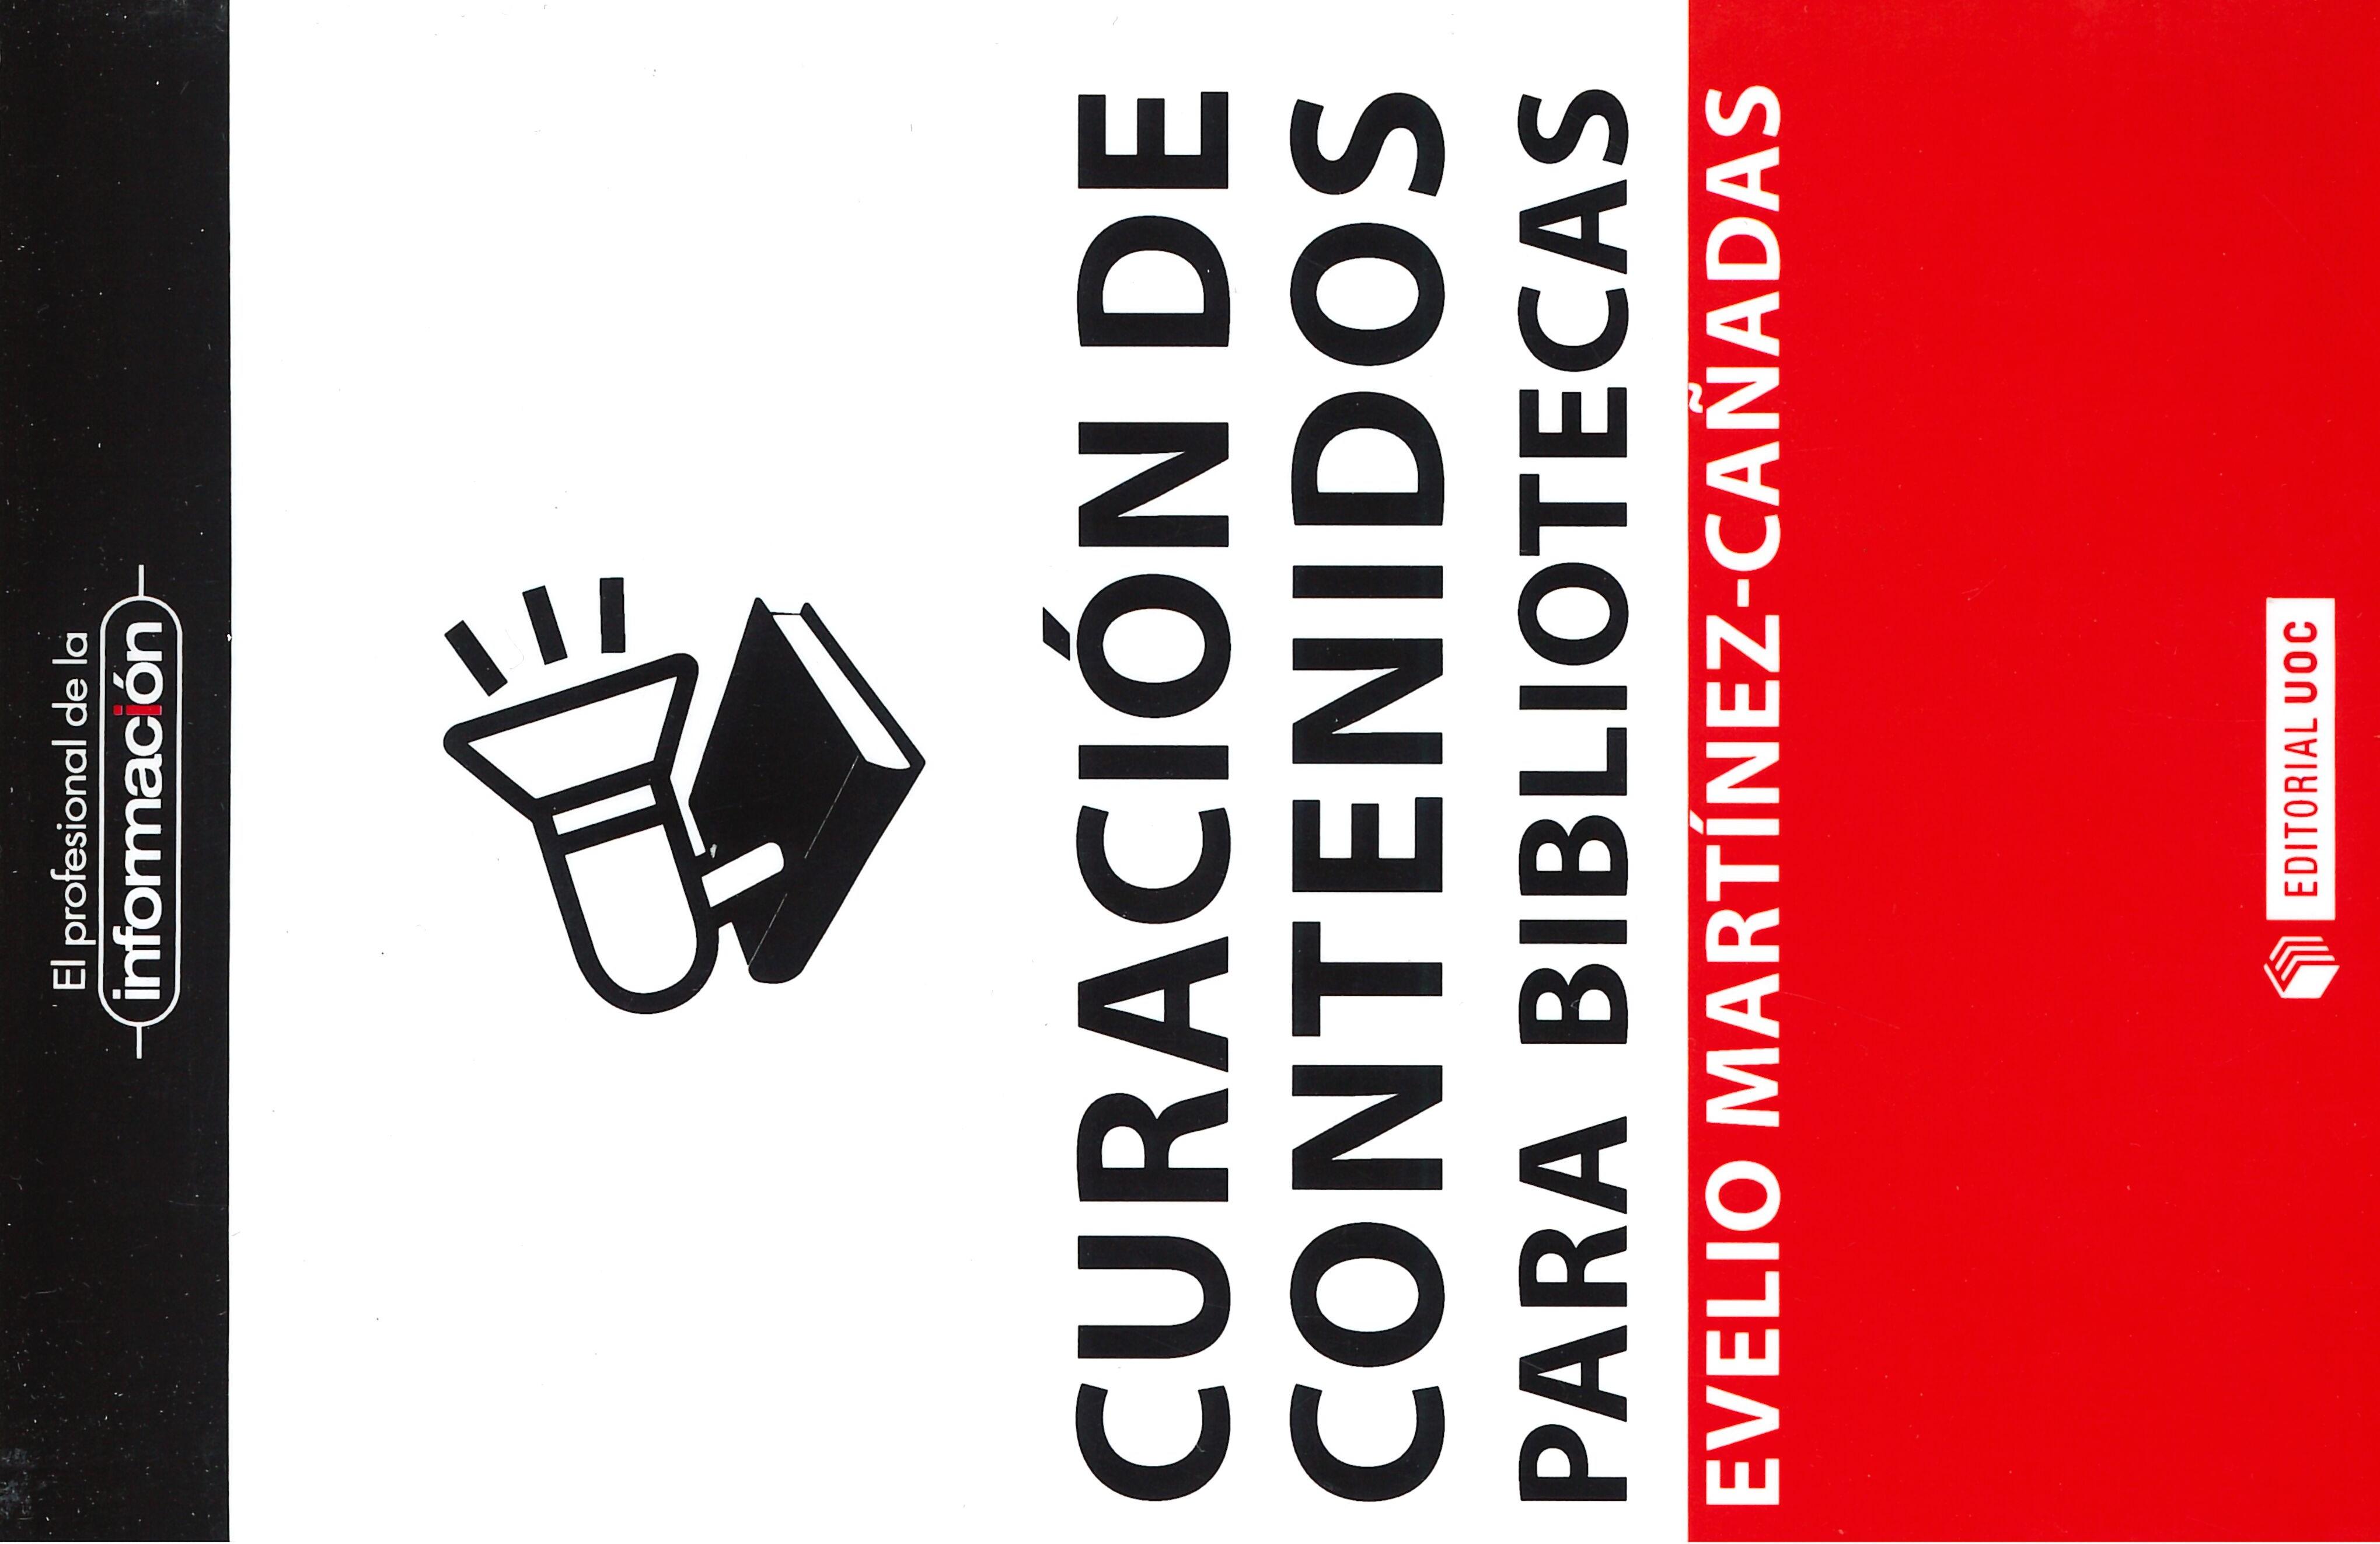 curacion_de_contenidos.jpg